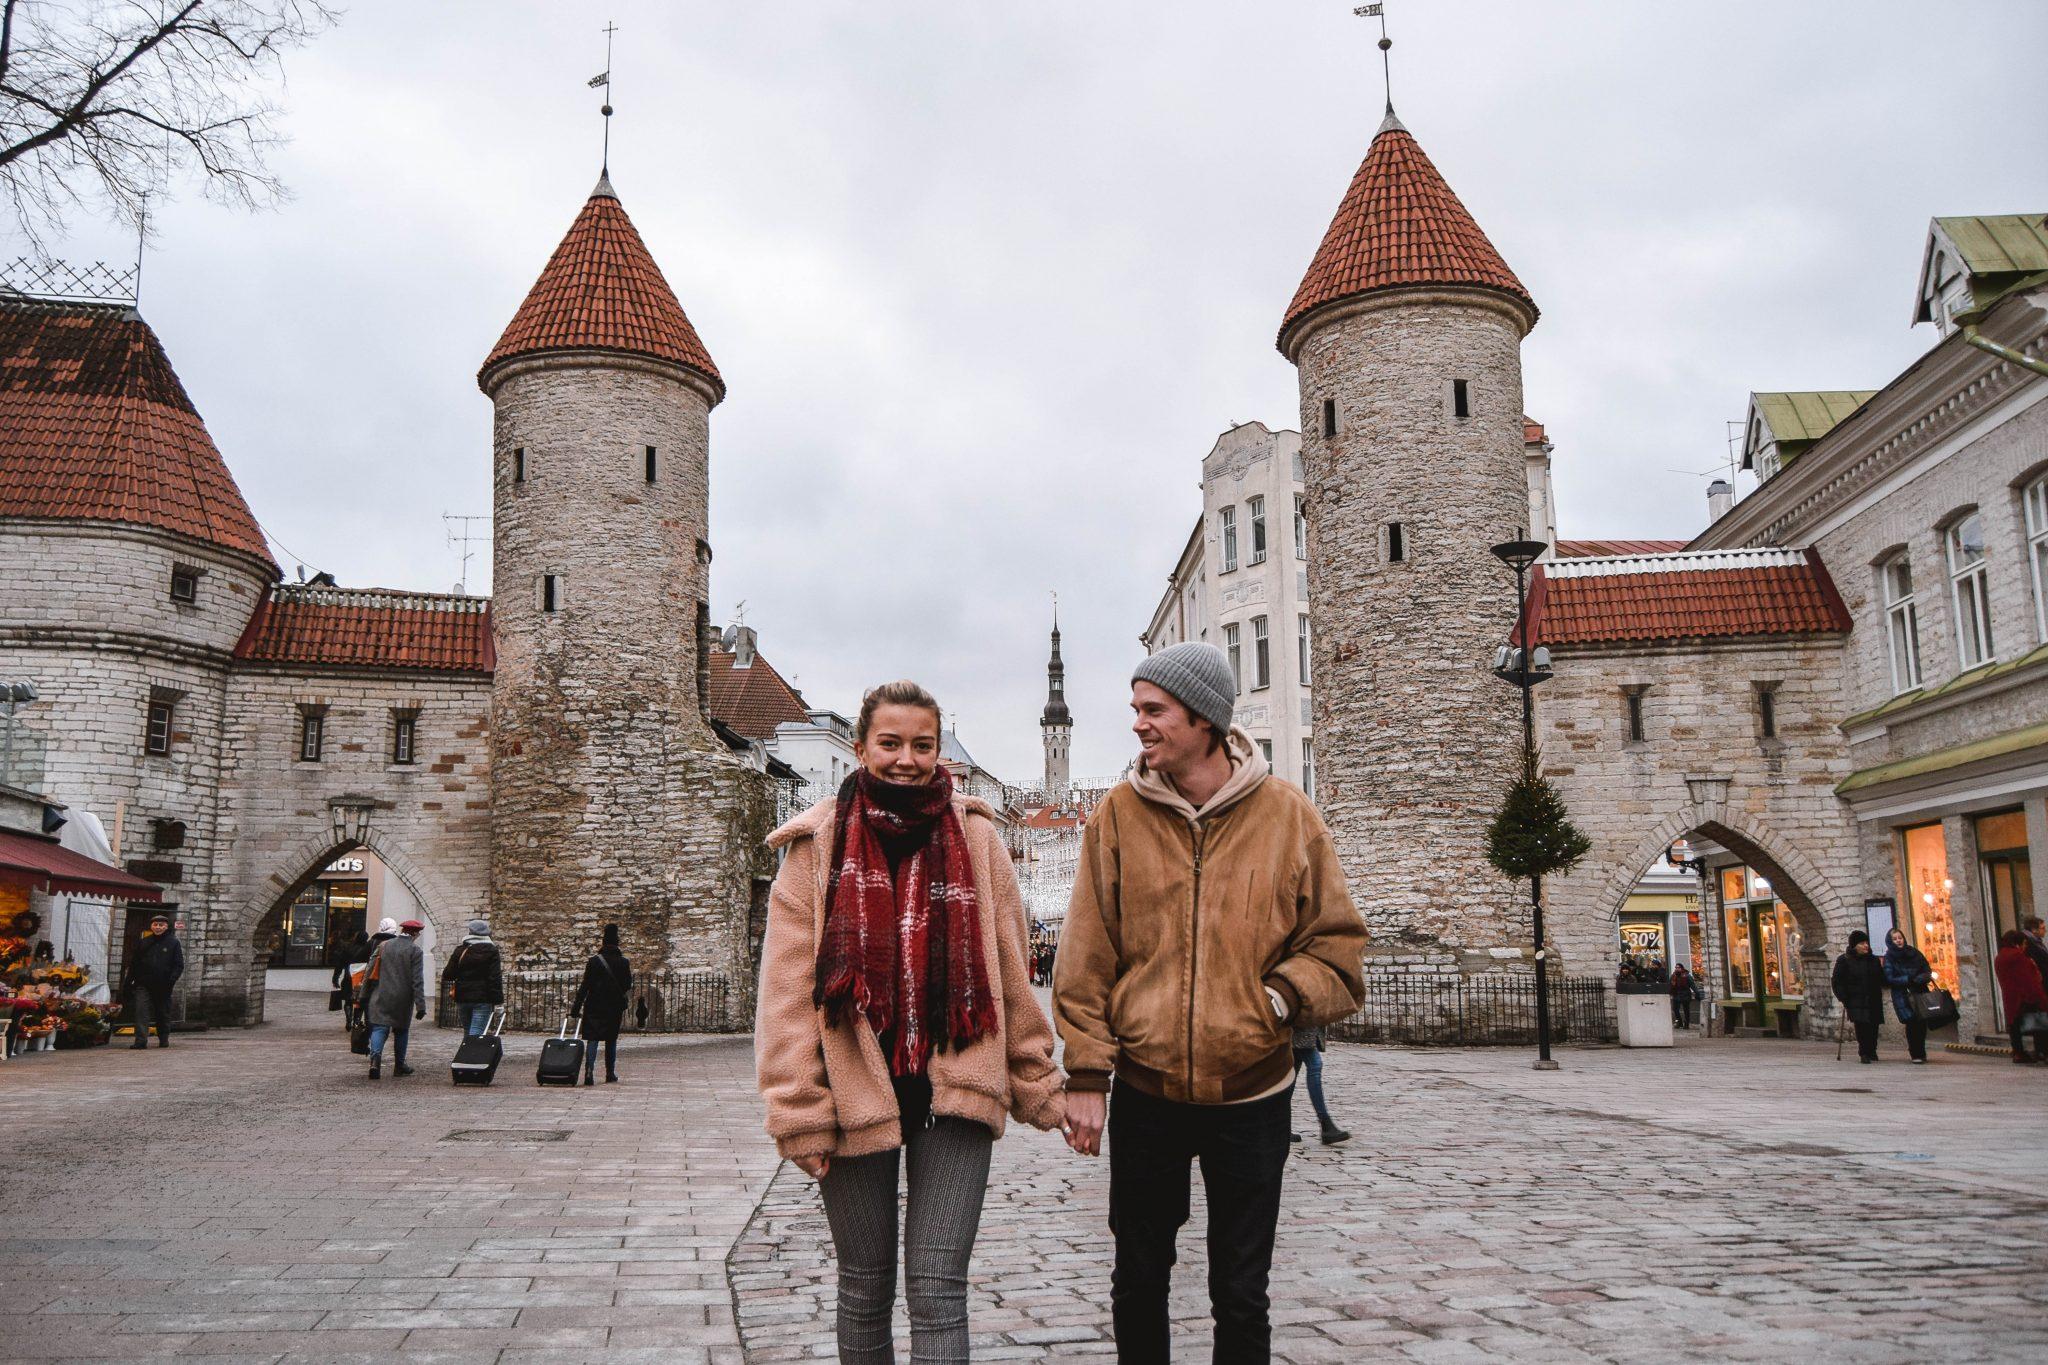 Things To Do In Tallinn In Winter Tallinn Things To Do - Old Town Tallinn Estonia